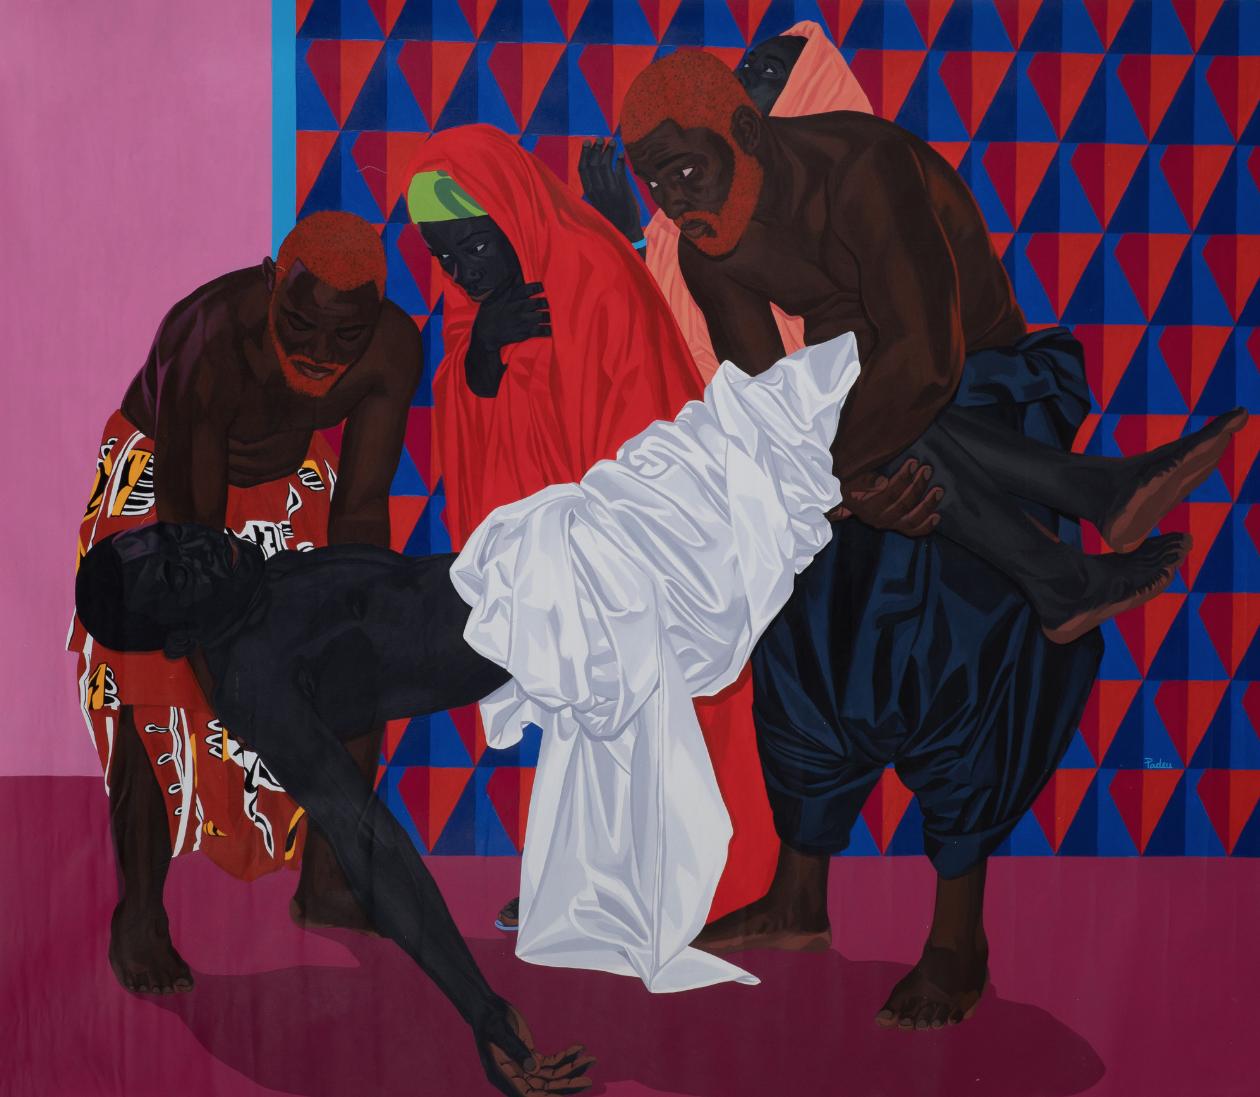 Marc Padeu (né en 1990, Cameroun) The king is dead, 2019. Courtesy of the artist